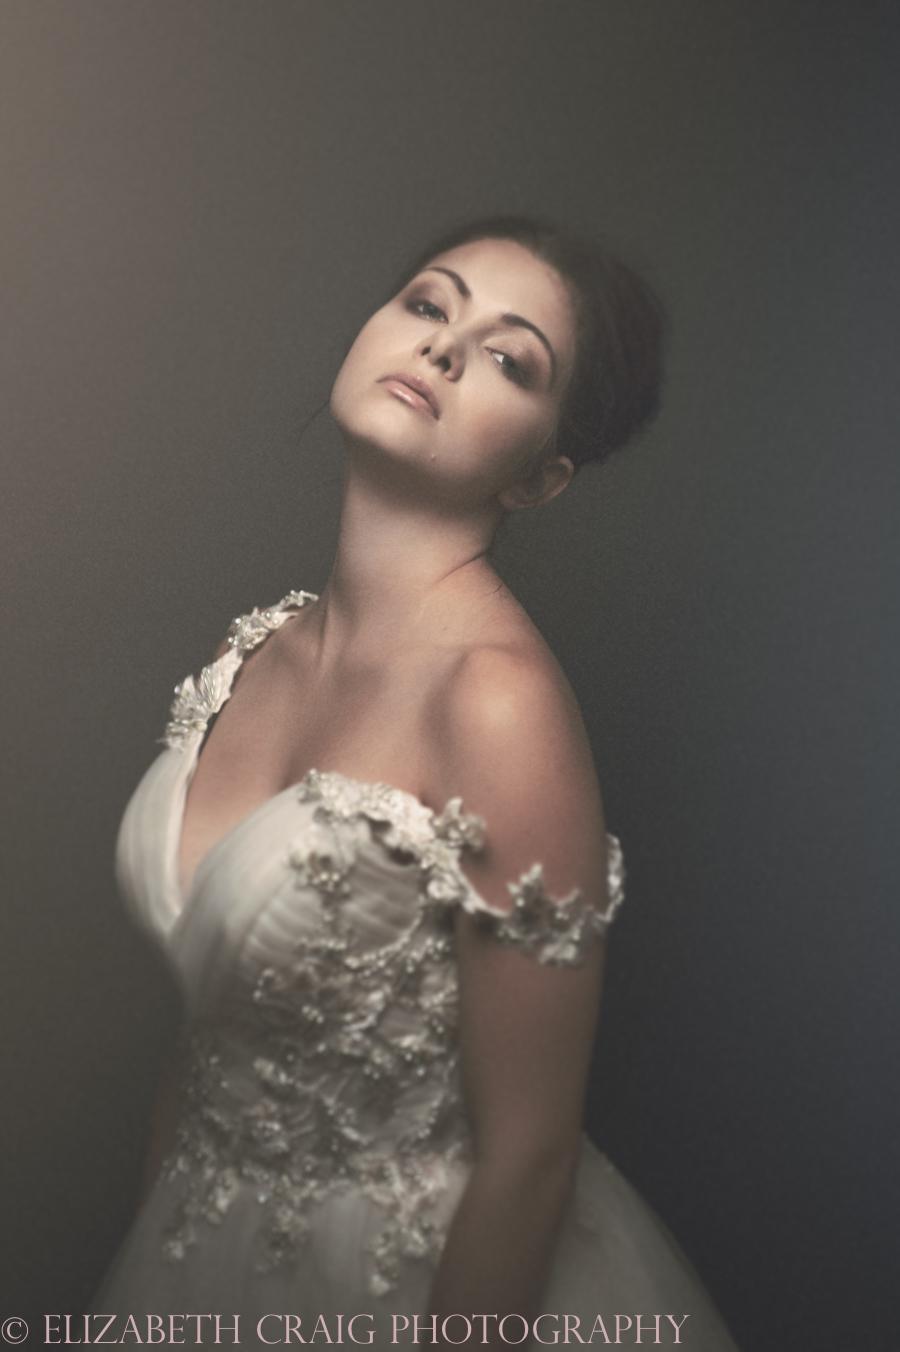 elizabeth-craig-fashion-boudoir-photography-006